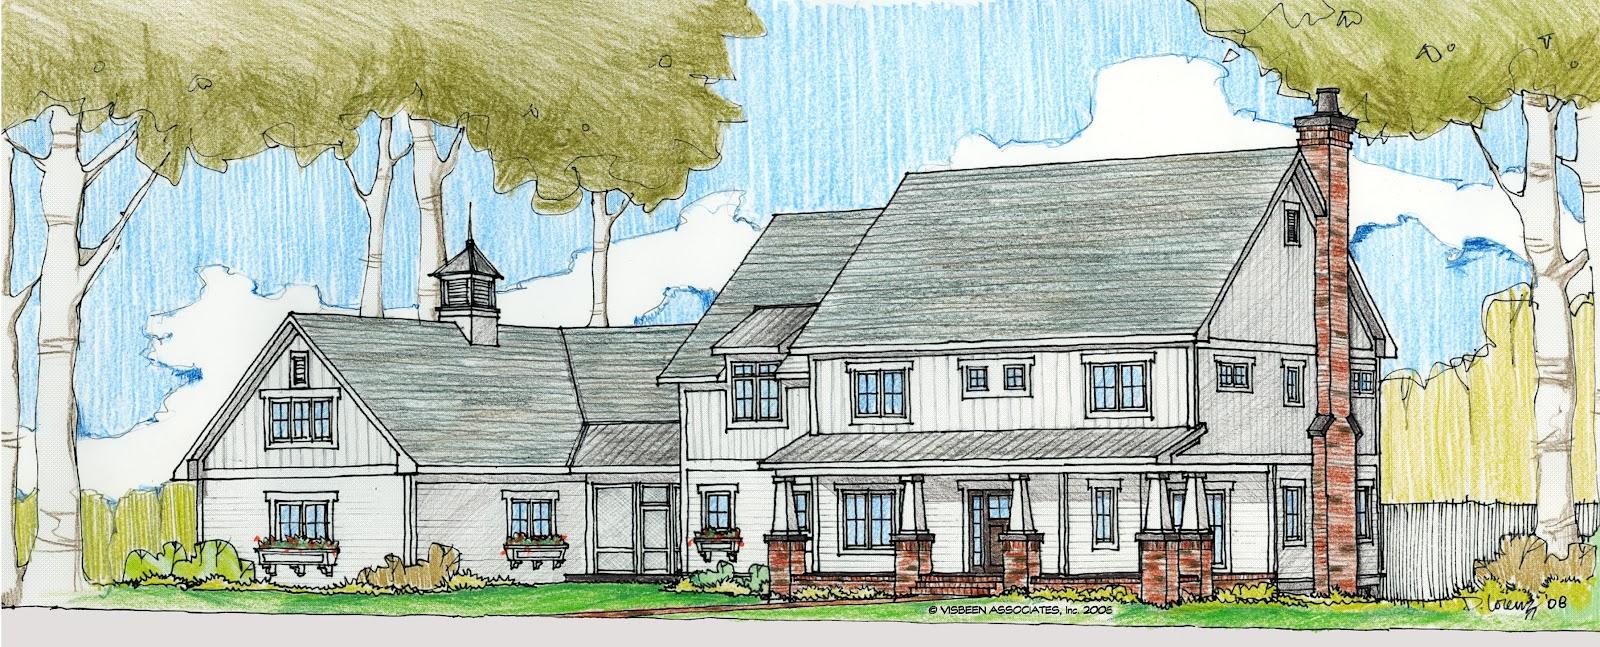 Architectural tutorial the american farmhouse for American farmhouse style architecture